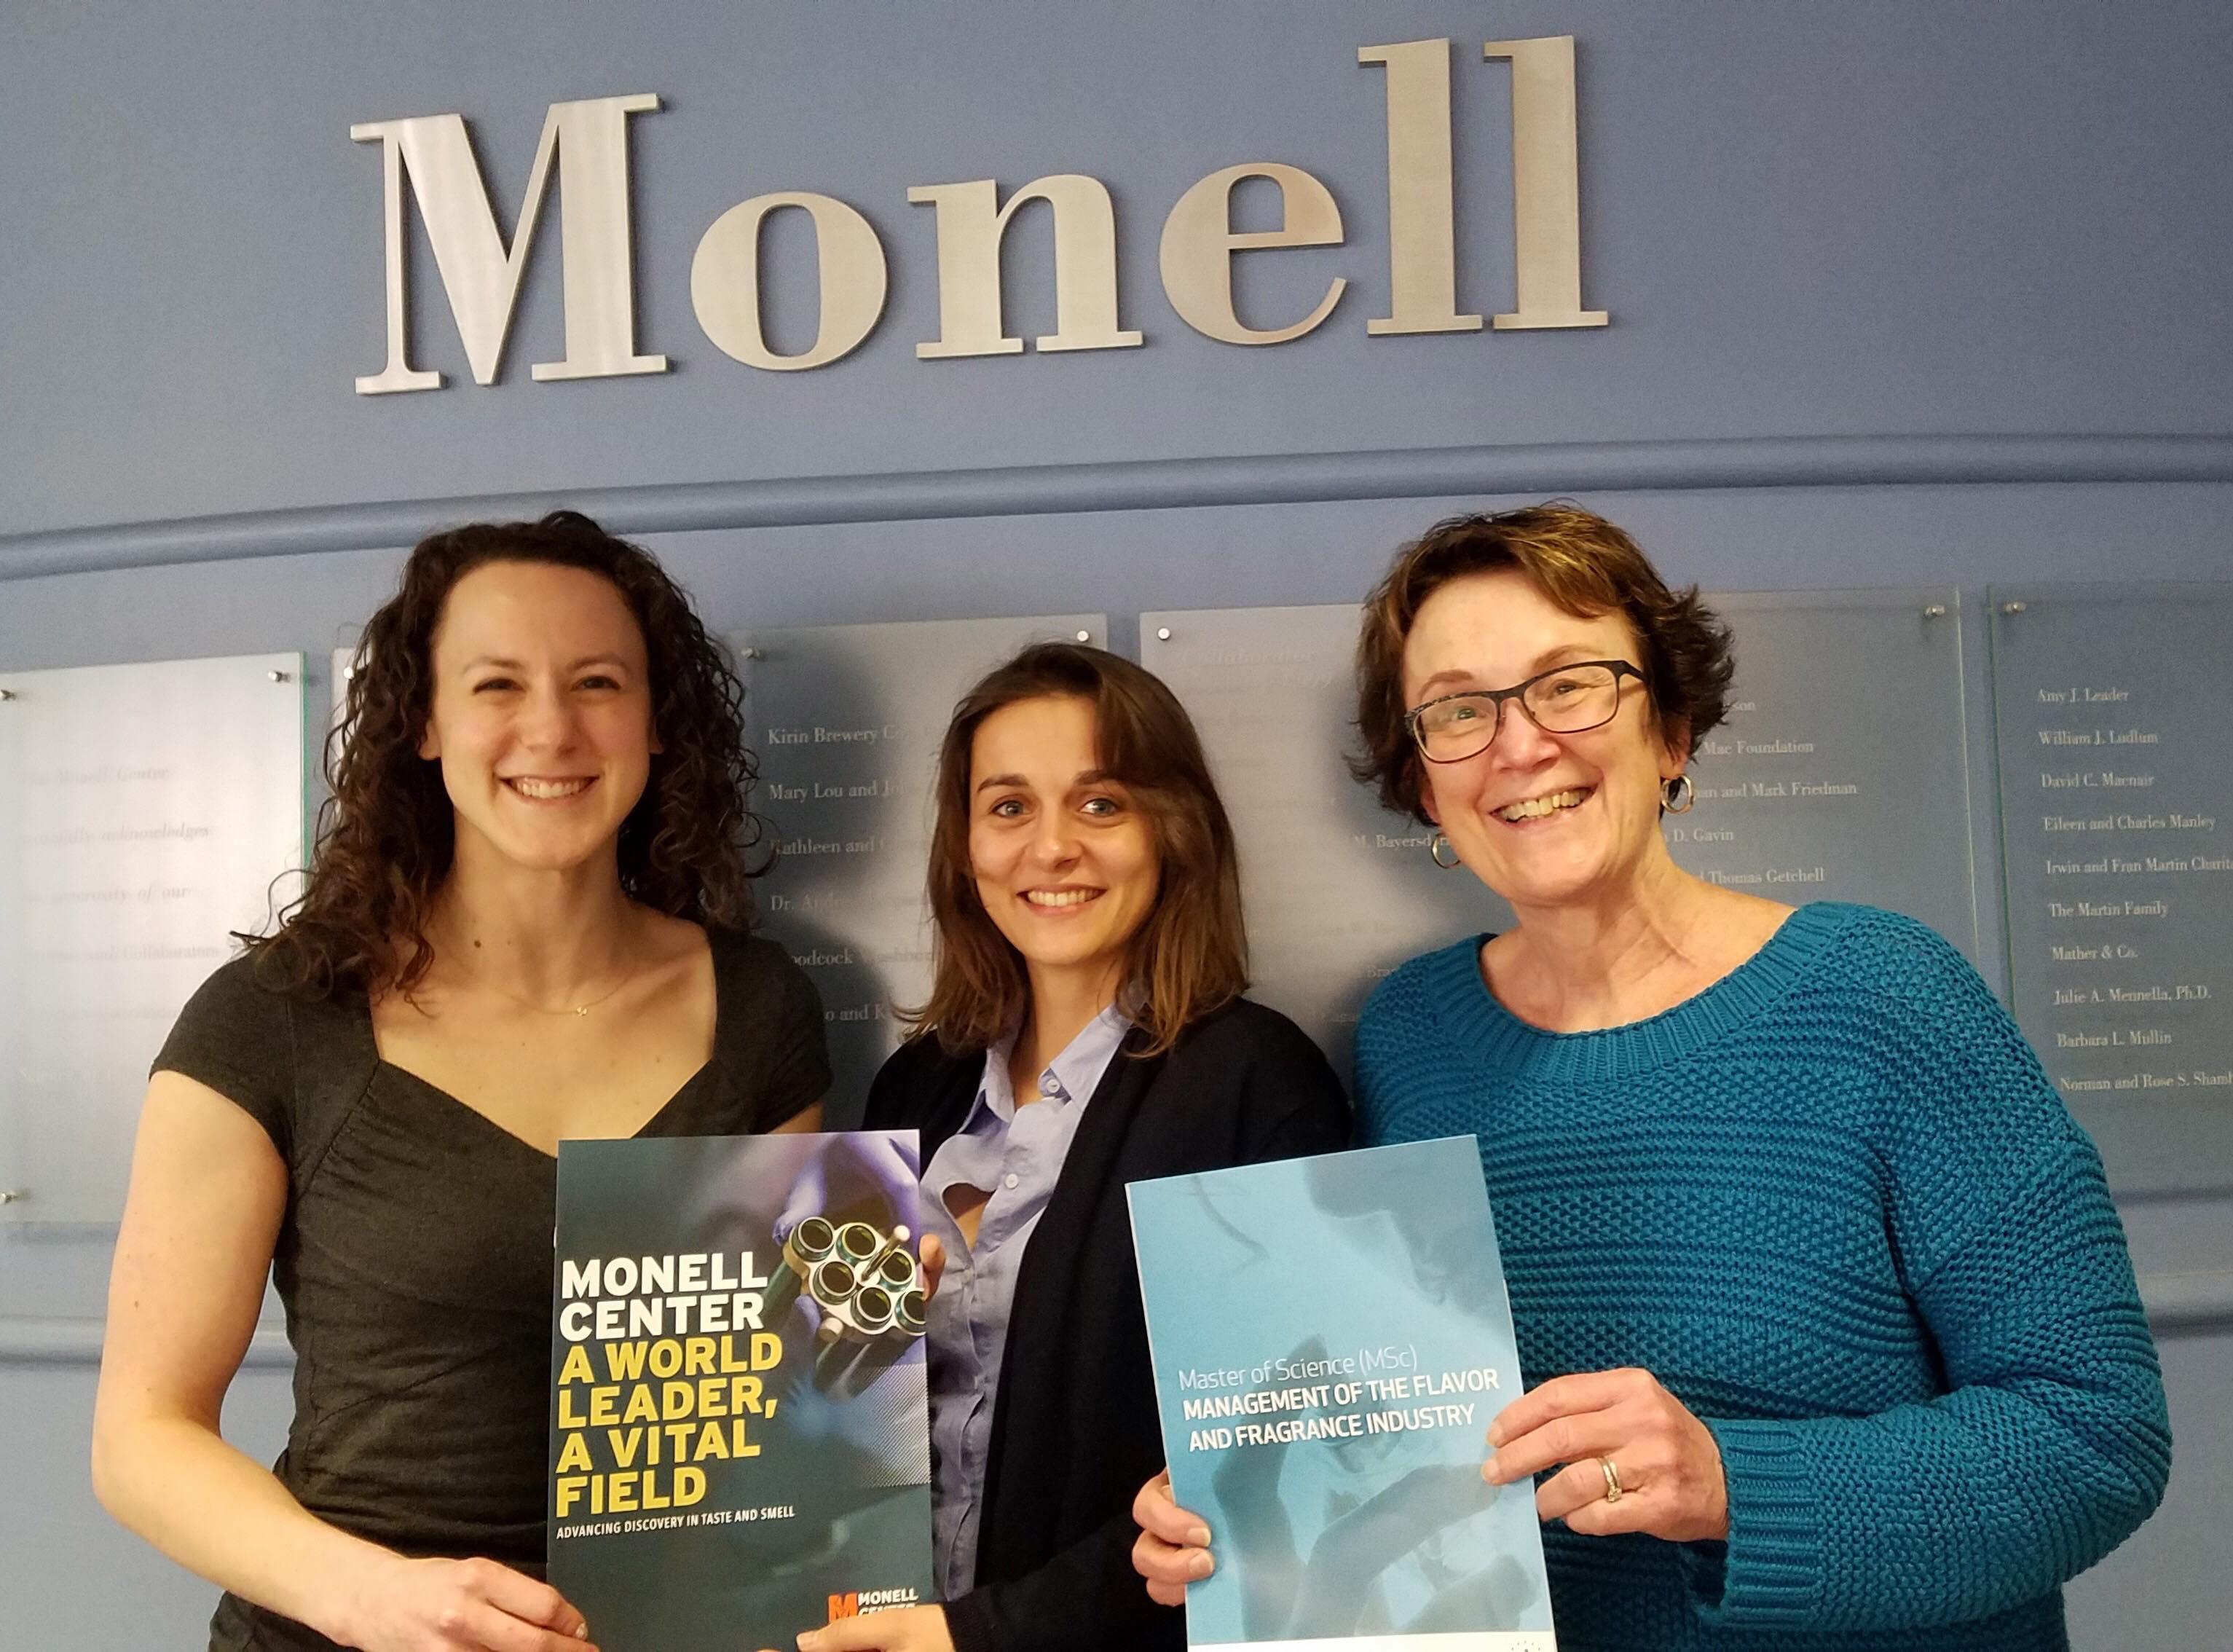 Equipe com du Monell